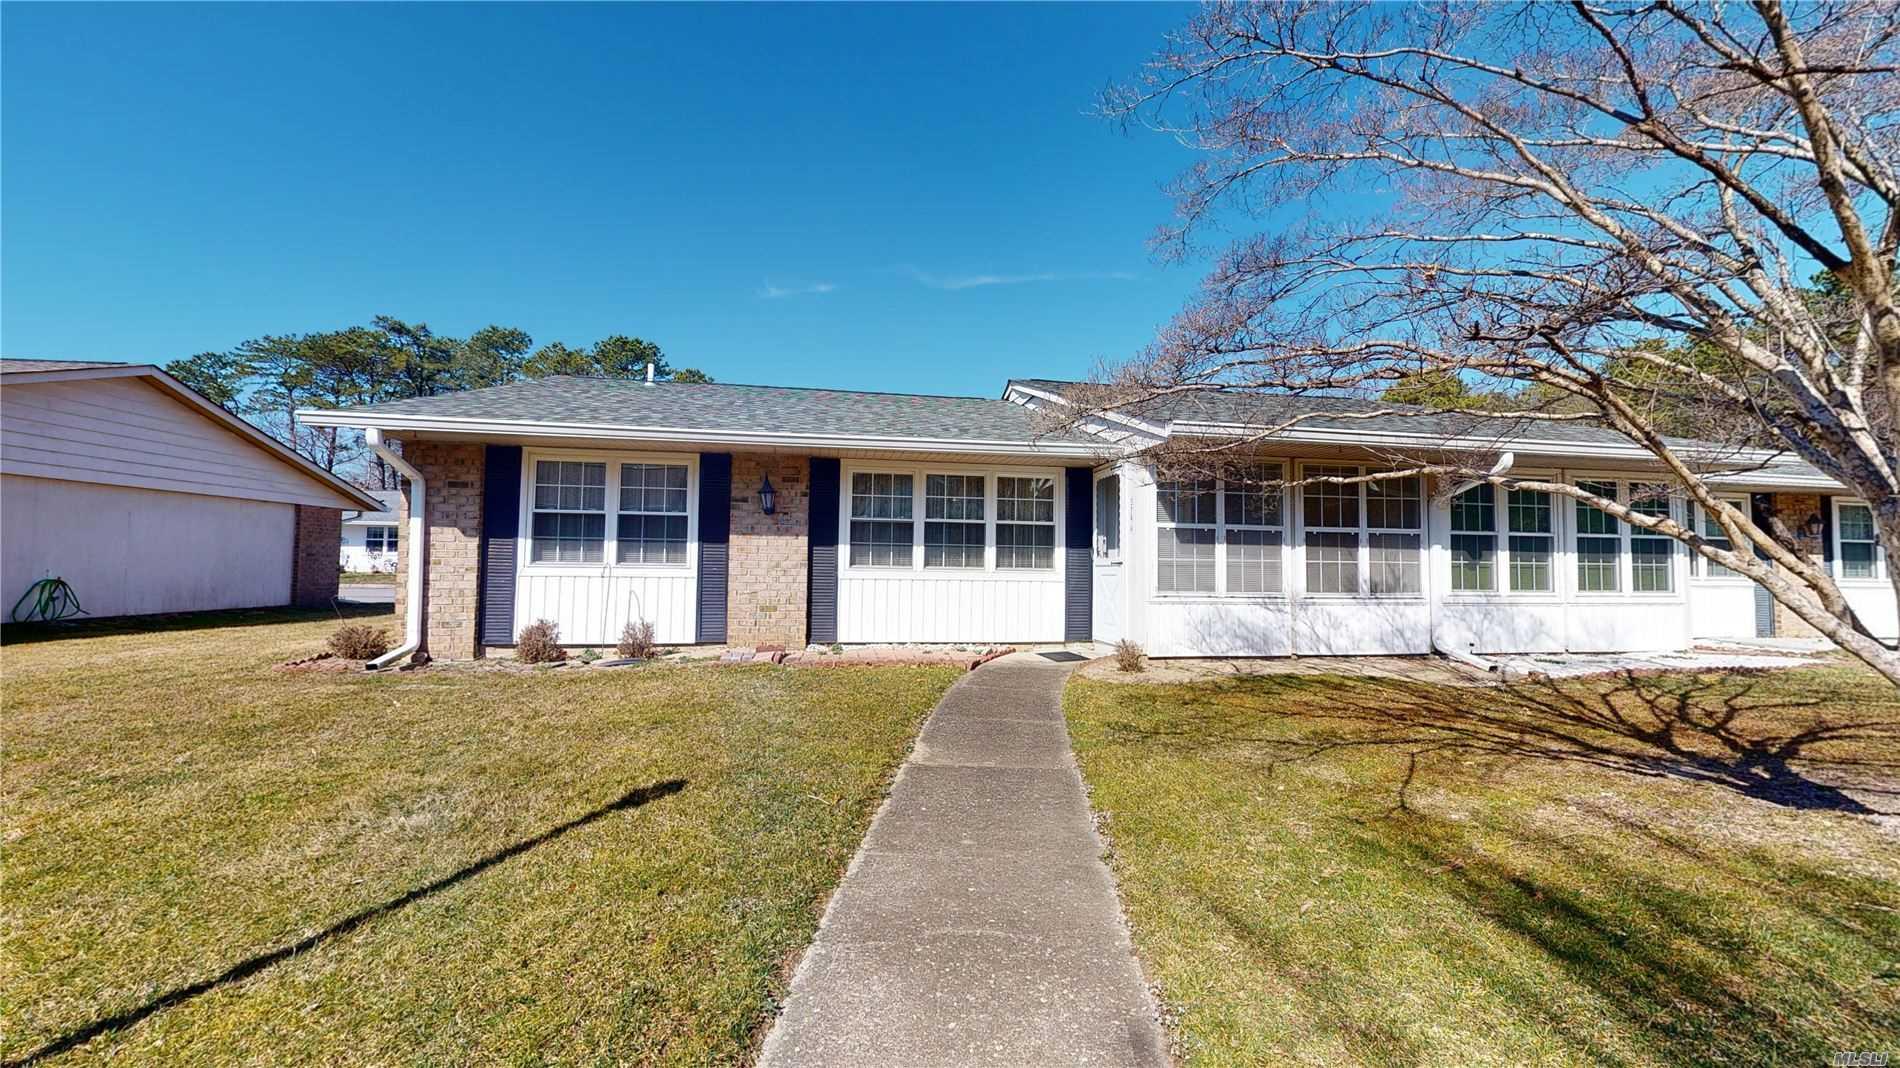 Property for sale at 374 Woodbridge Drive # A, Ridge NY 11961, Ridge,  New York 11961